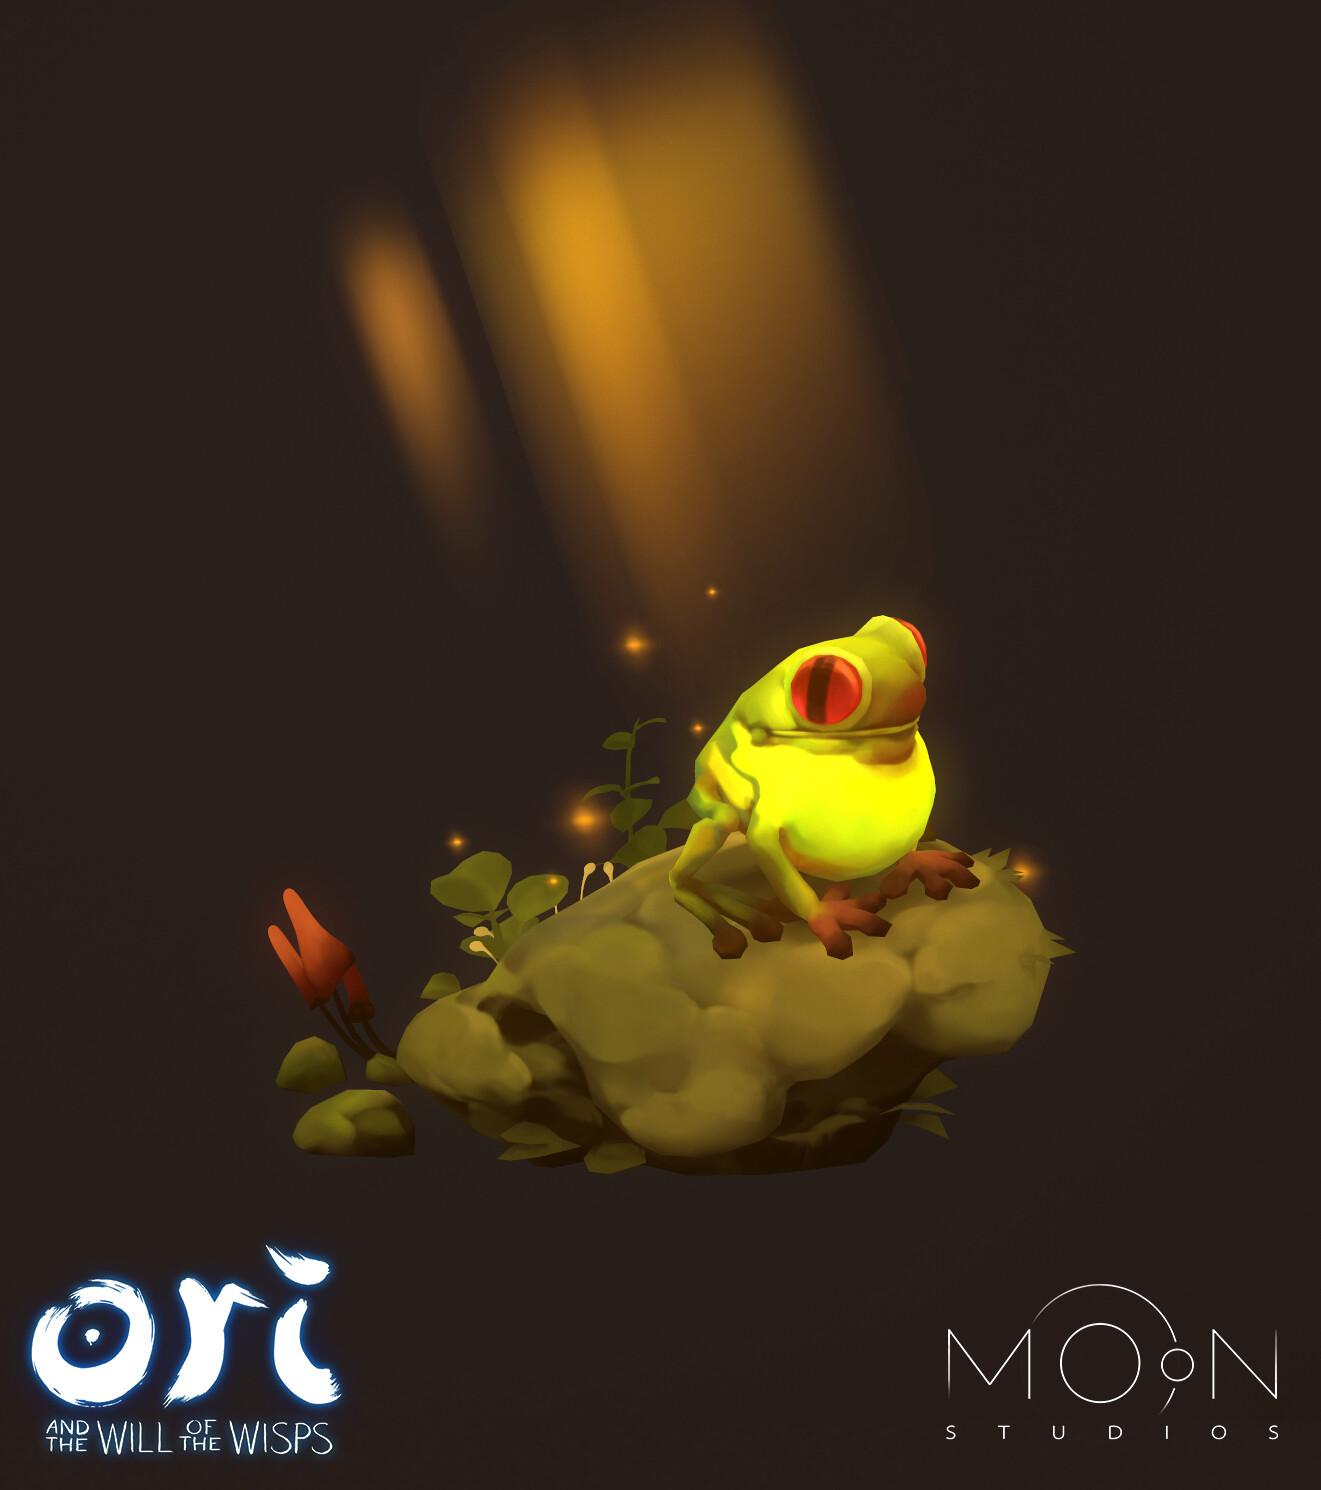 Cute Frog =) Concept by Mickhail Rakhmatullin